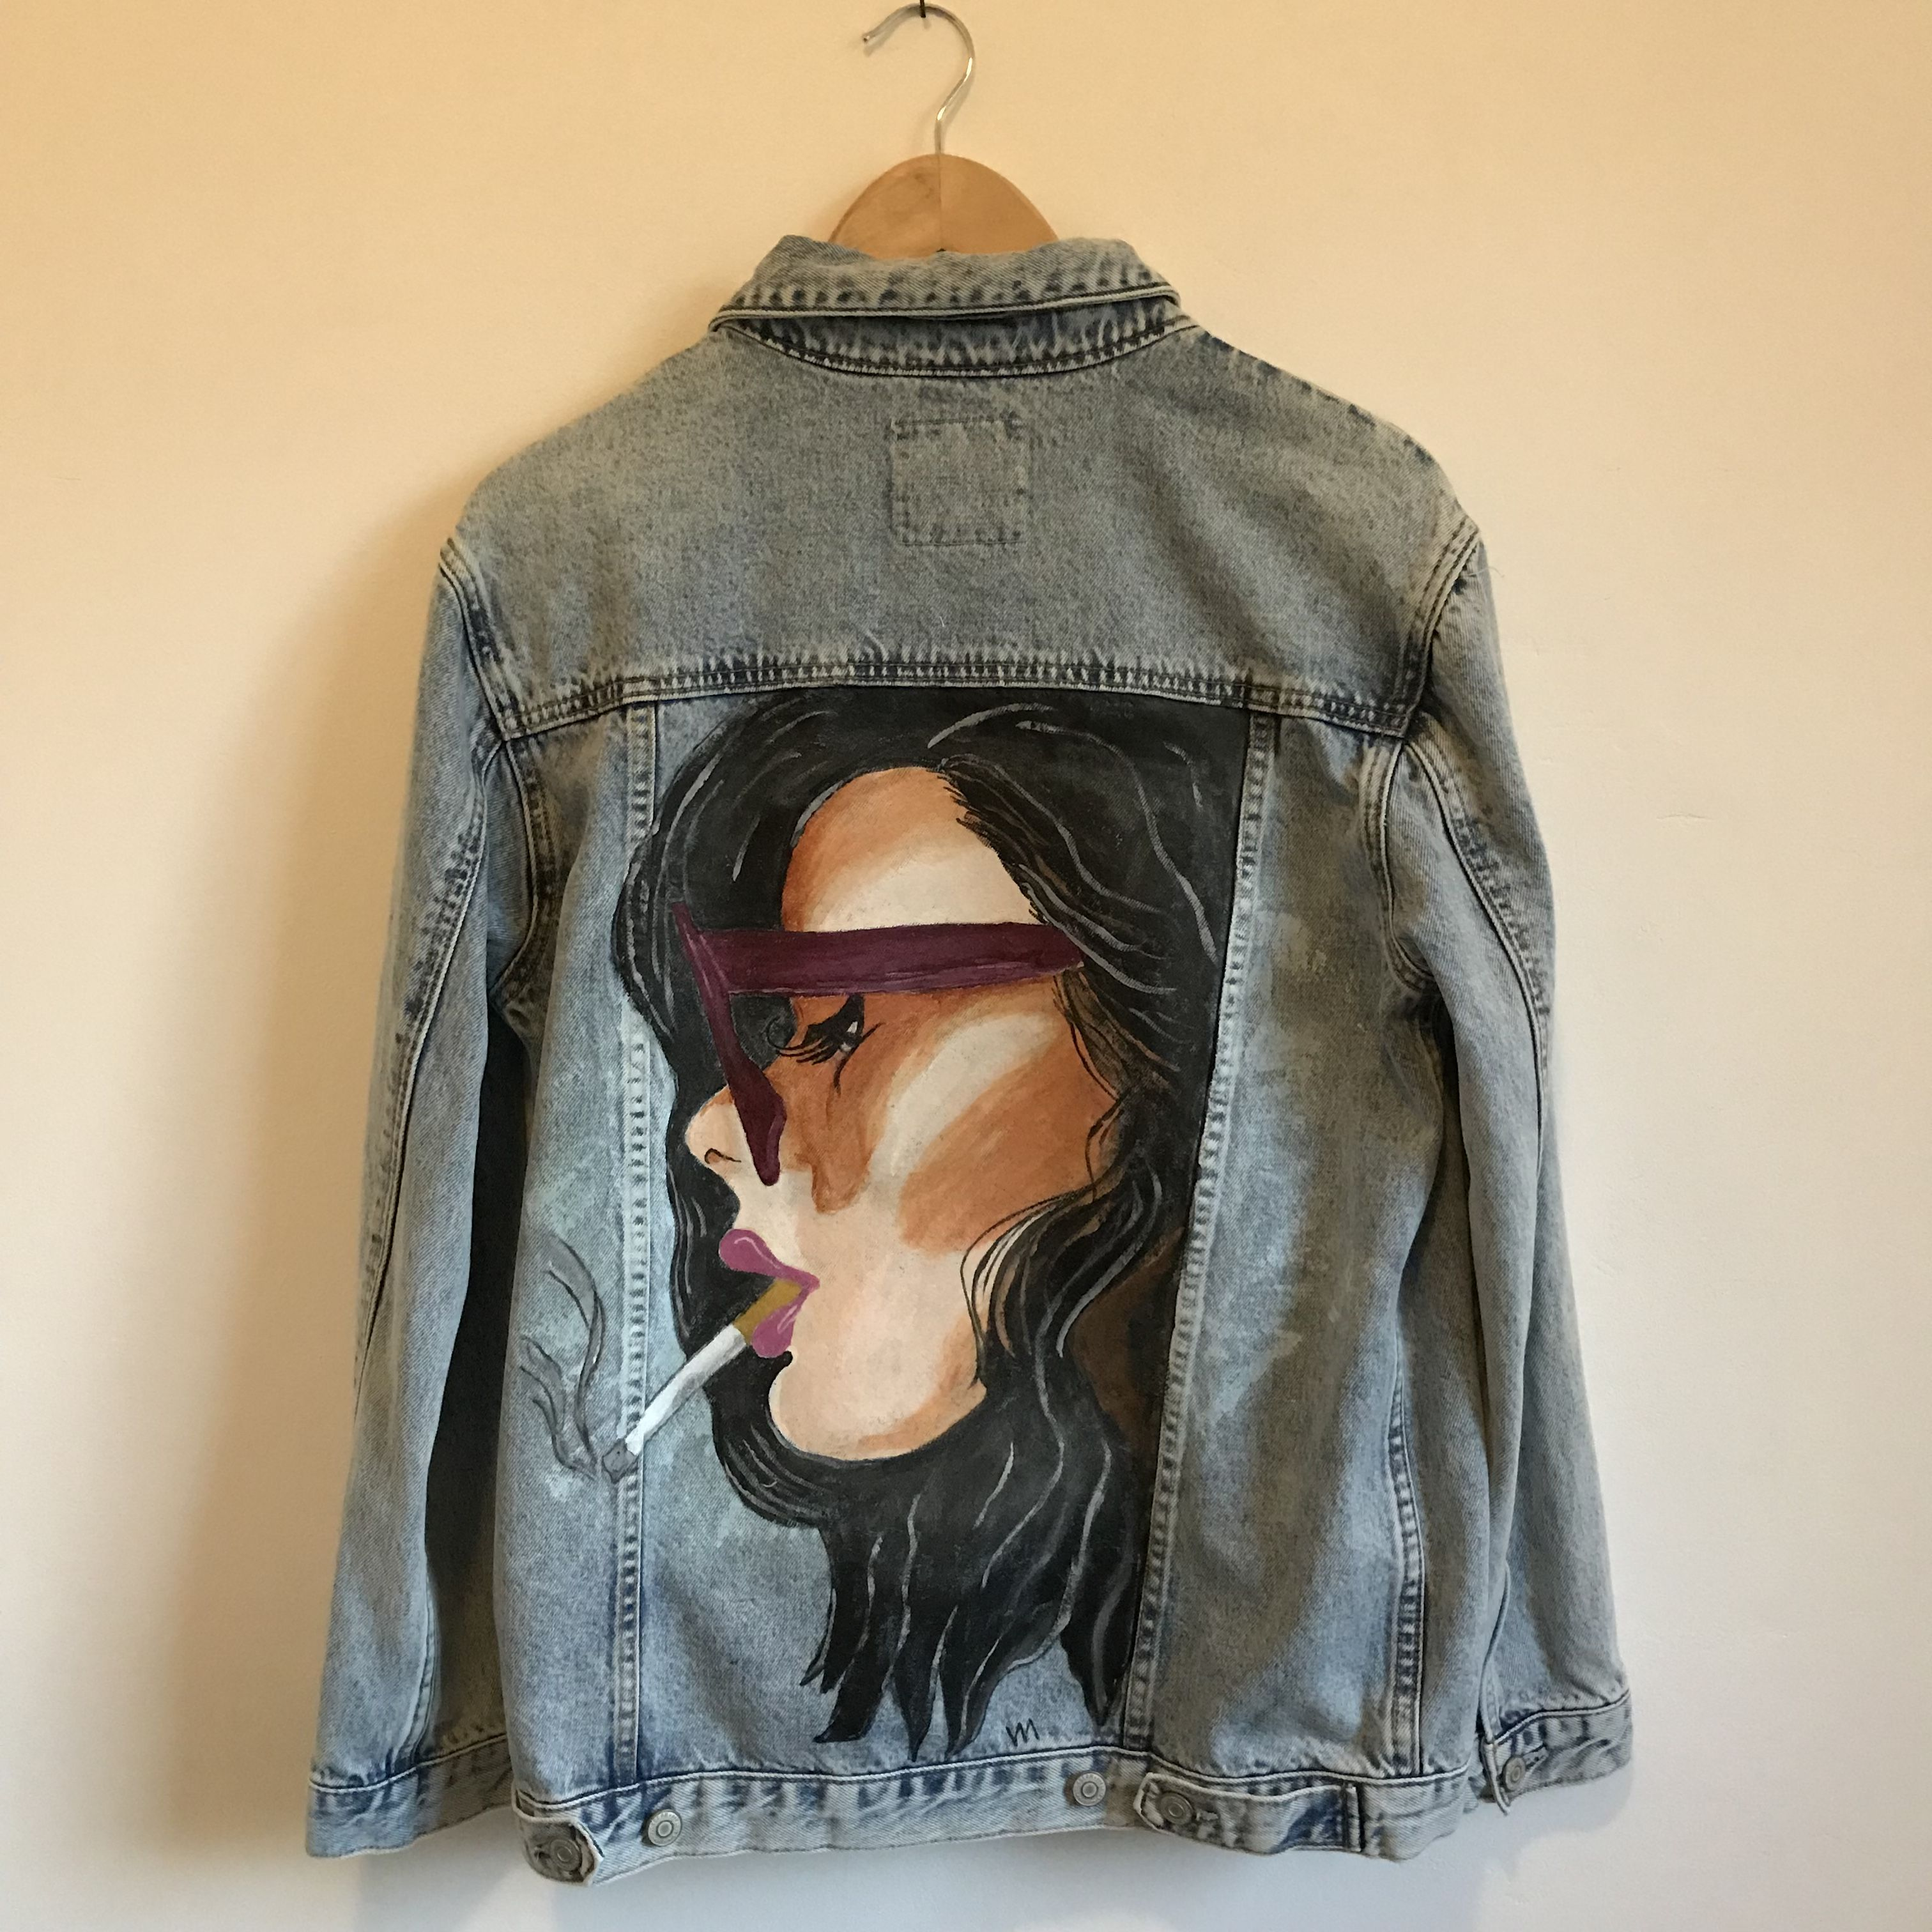 039b87d599326 Hand Painted Denim jacket by  bluerooz   instagram  acryl  denim  painted